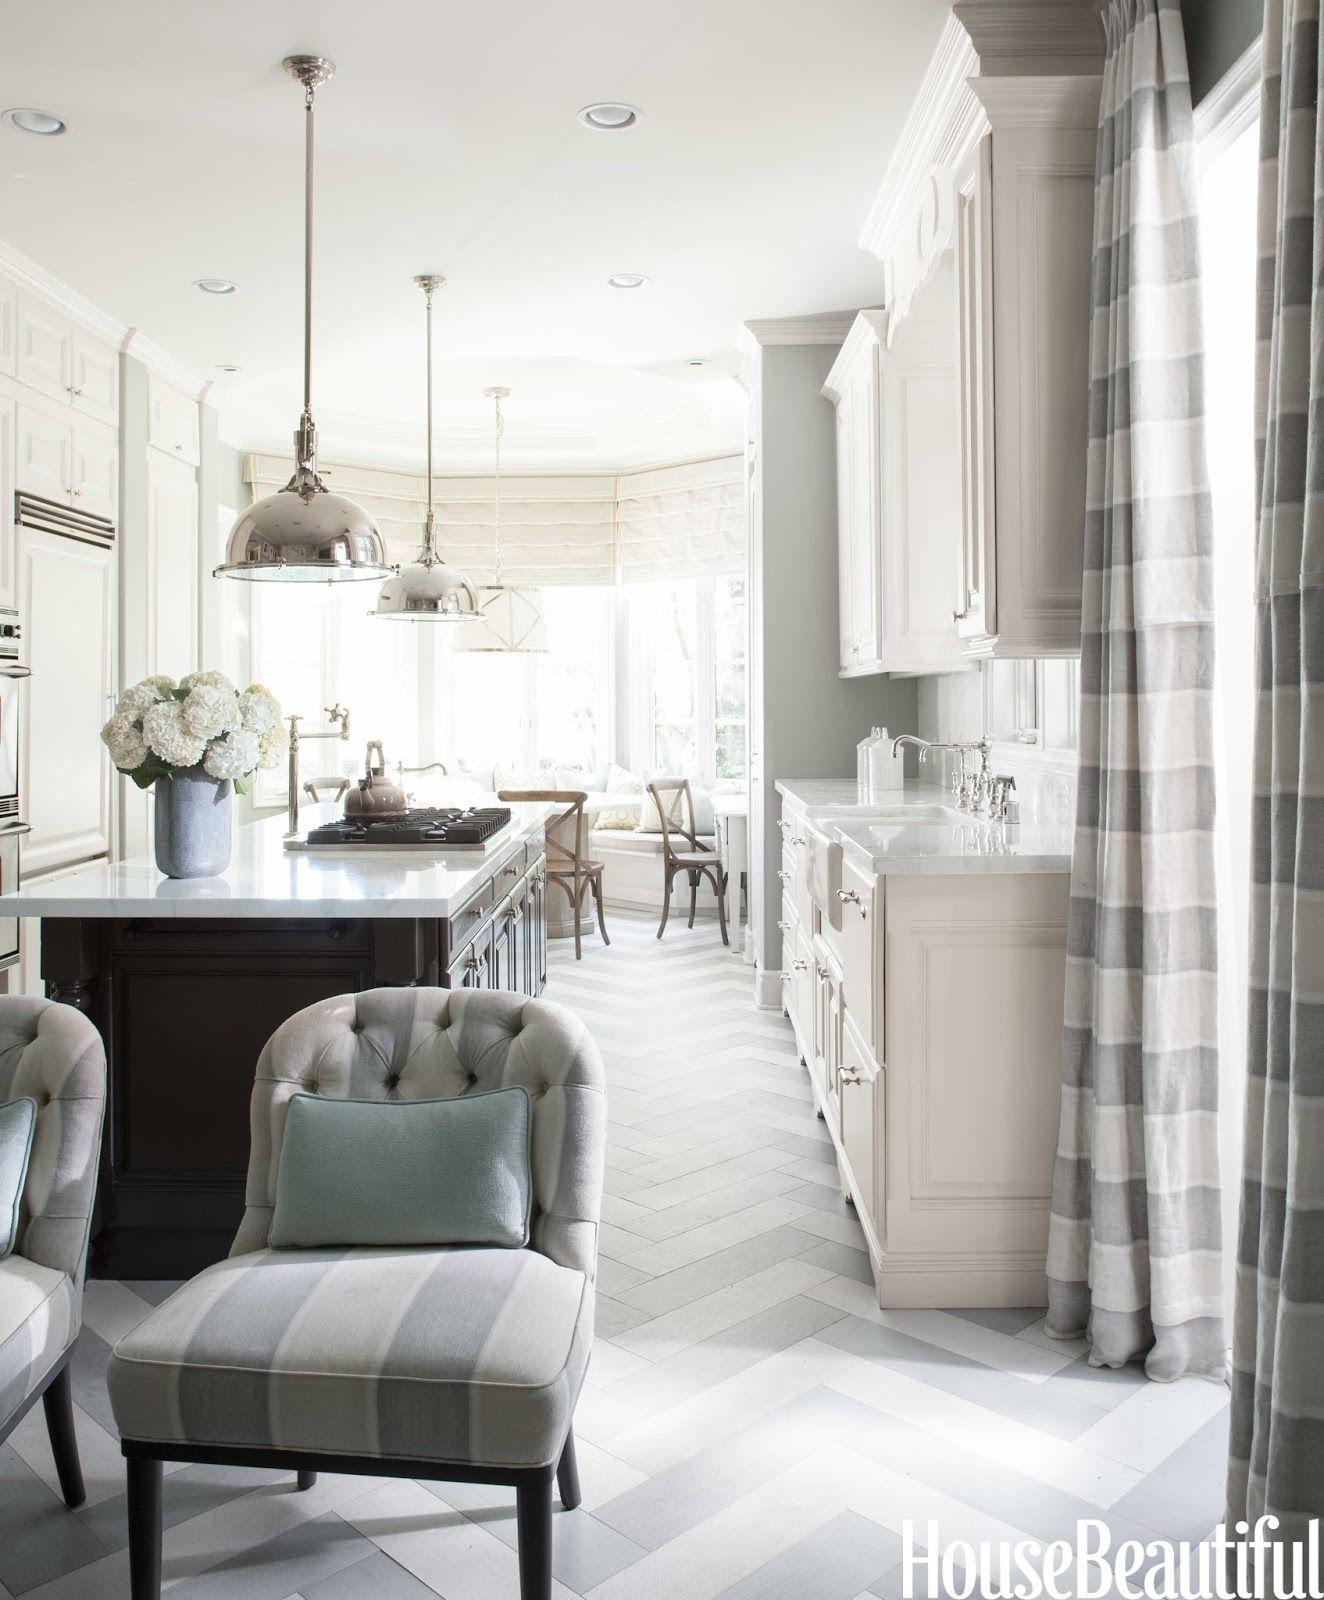 Gray kitchen, herringbone floor pattern.